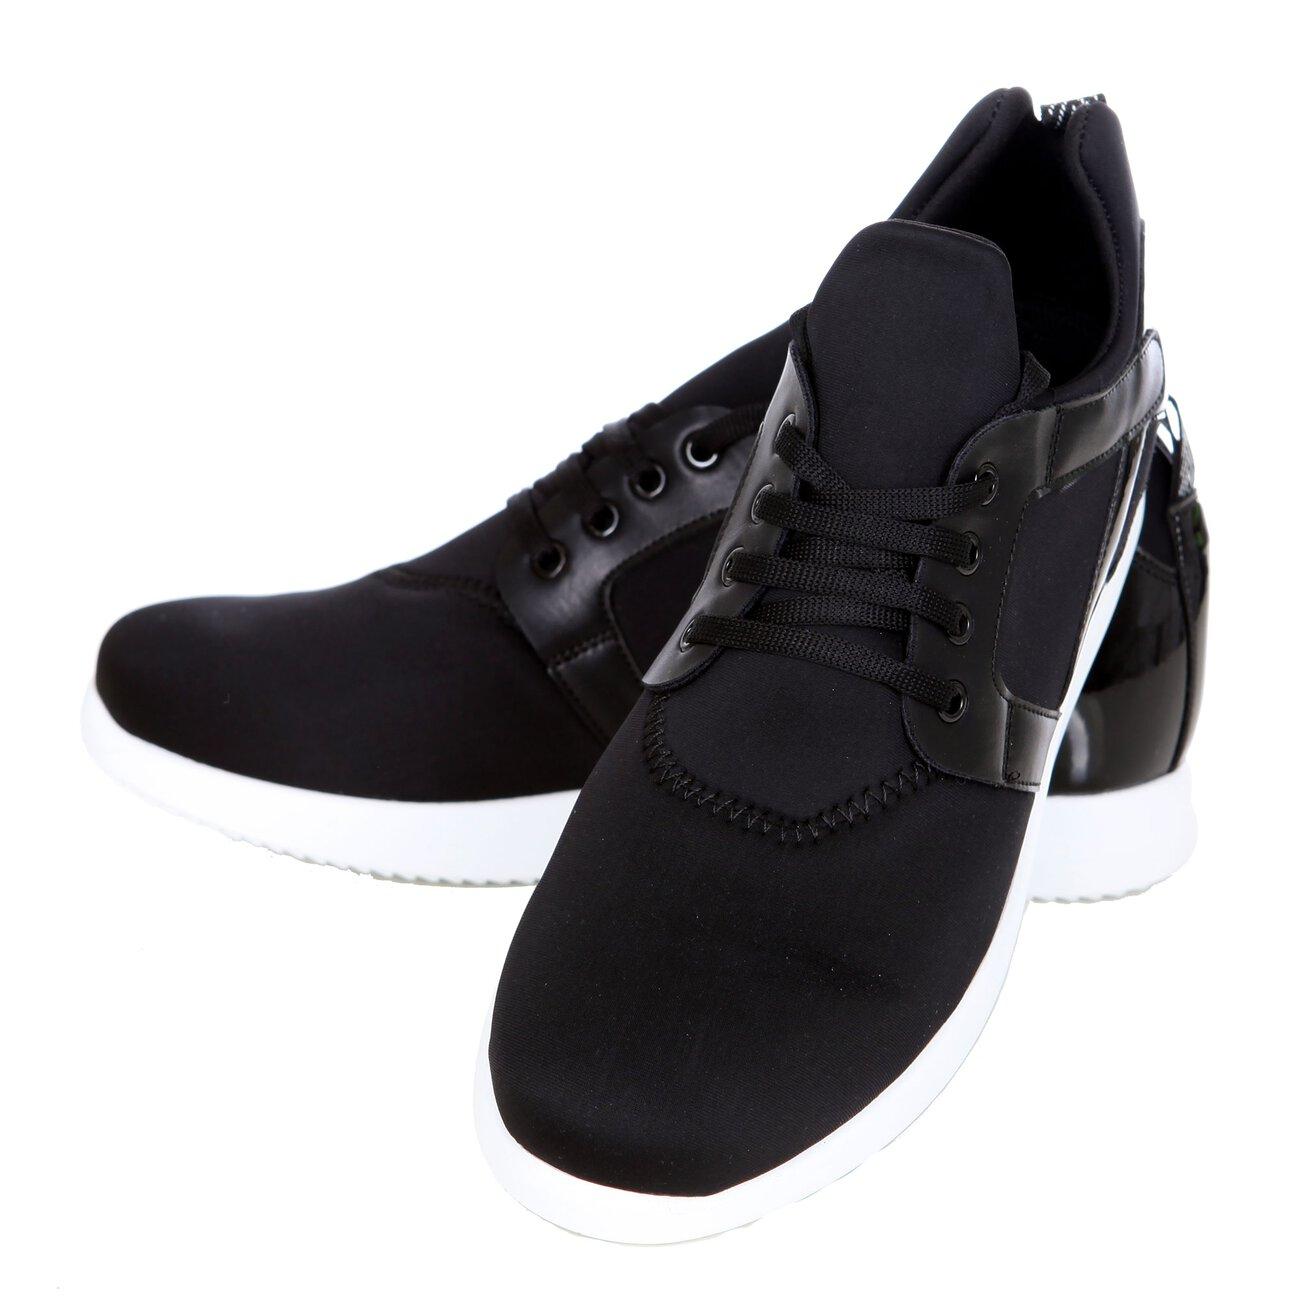 sneaker herren schuhe fashion sport low cut neopren schn rer. Black Bedroom Furniture Sets. Home Design Ideas